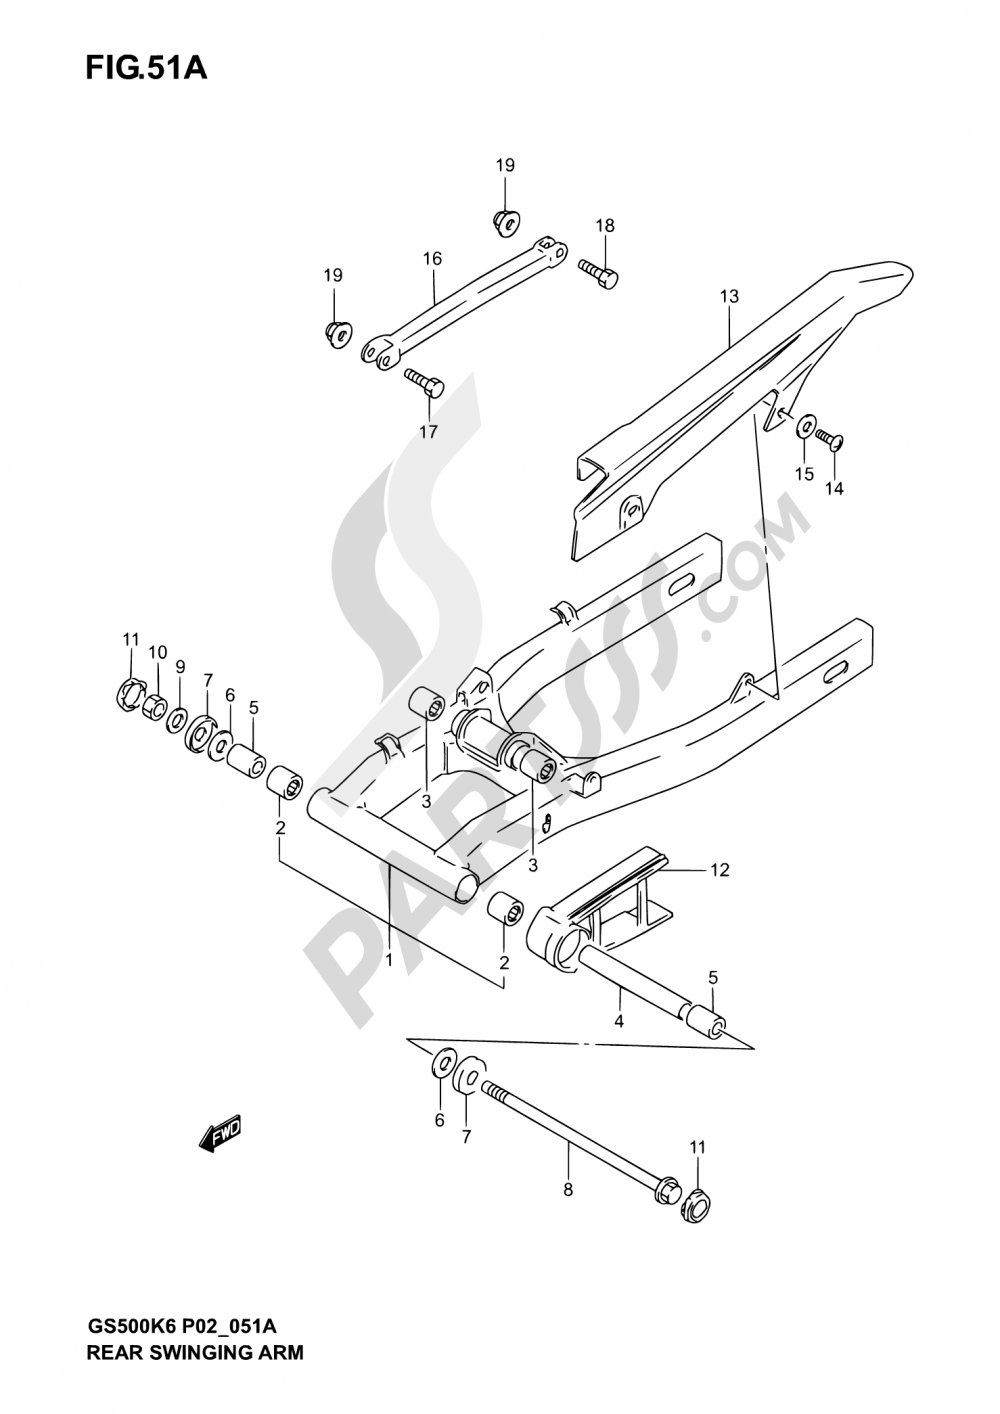 51A - REAR SWINGING ARM (MODEL K4/K5/K6) Suzuki GS500U 2004